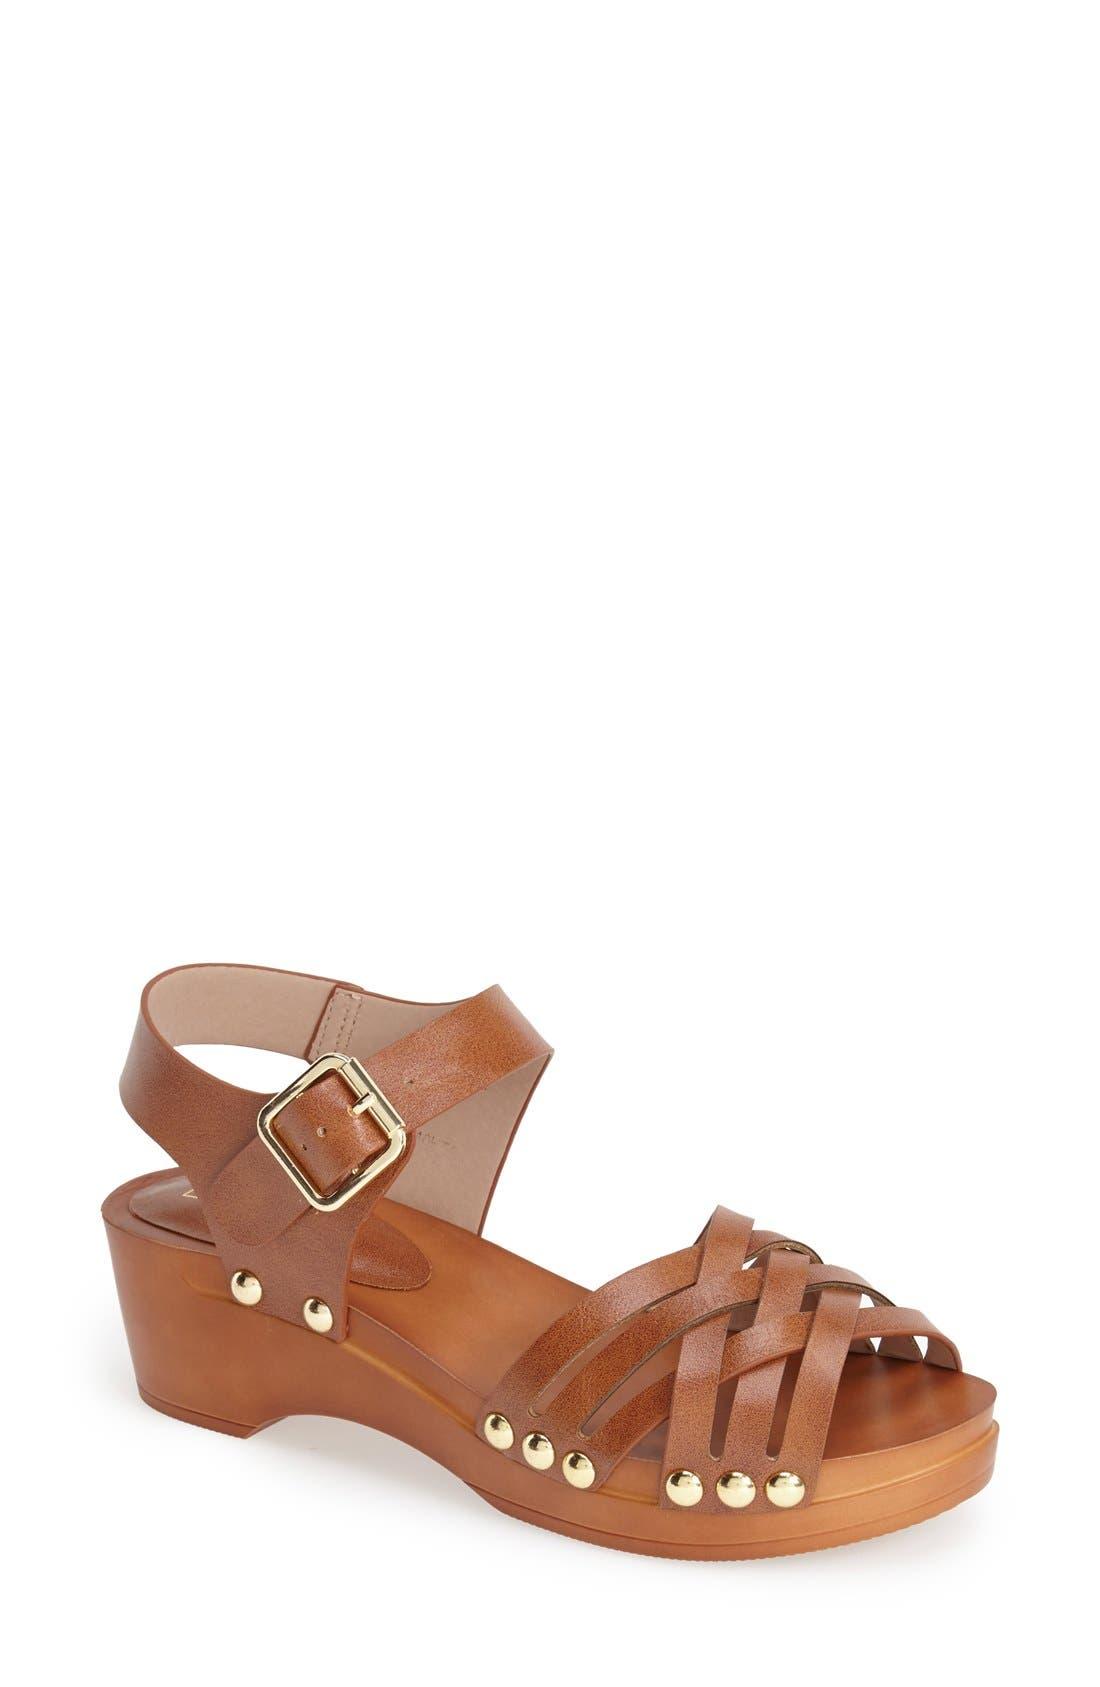 Alternate Image 1 Selected - Topshop Clog Wedge Sandal (Women)